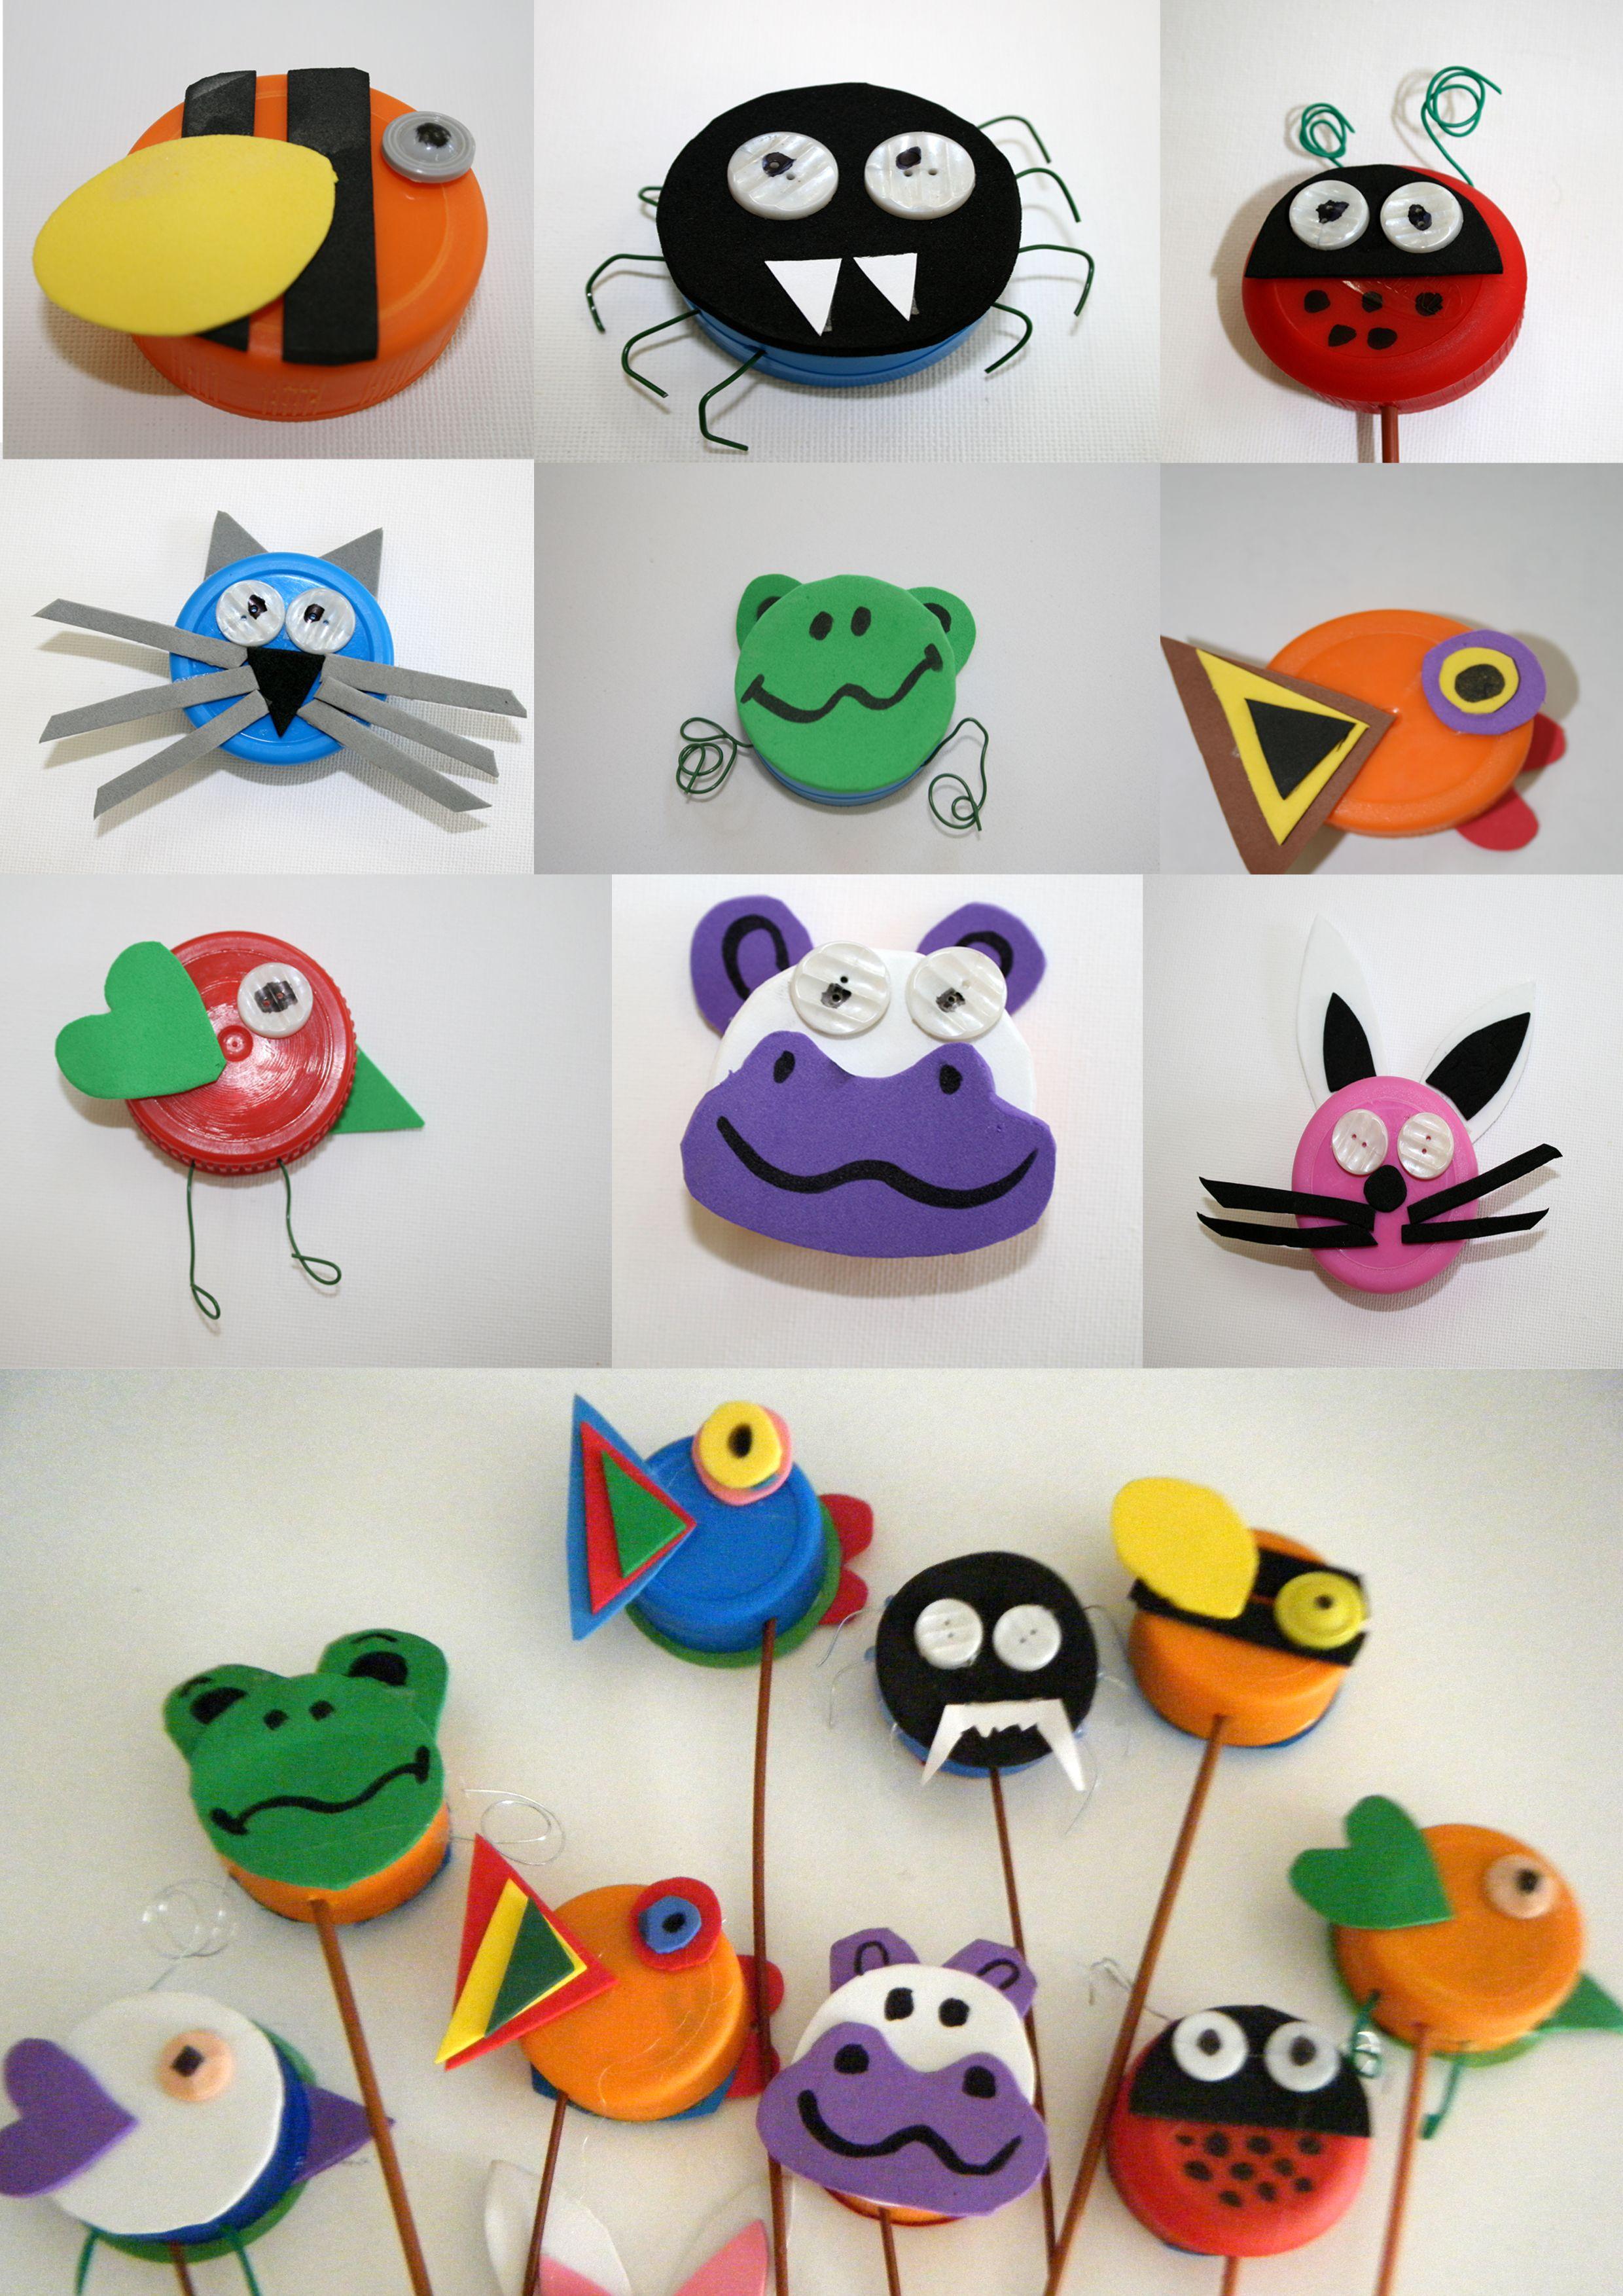 Pin de tilania du preez en Kids   Pinterest   Preescolar, Plástico y ...